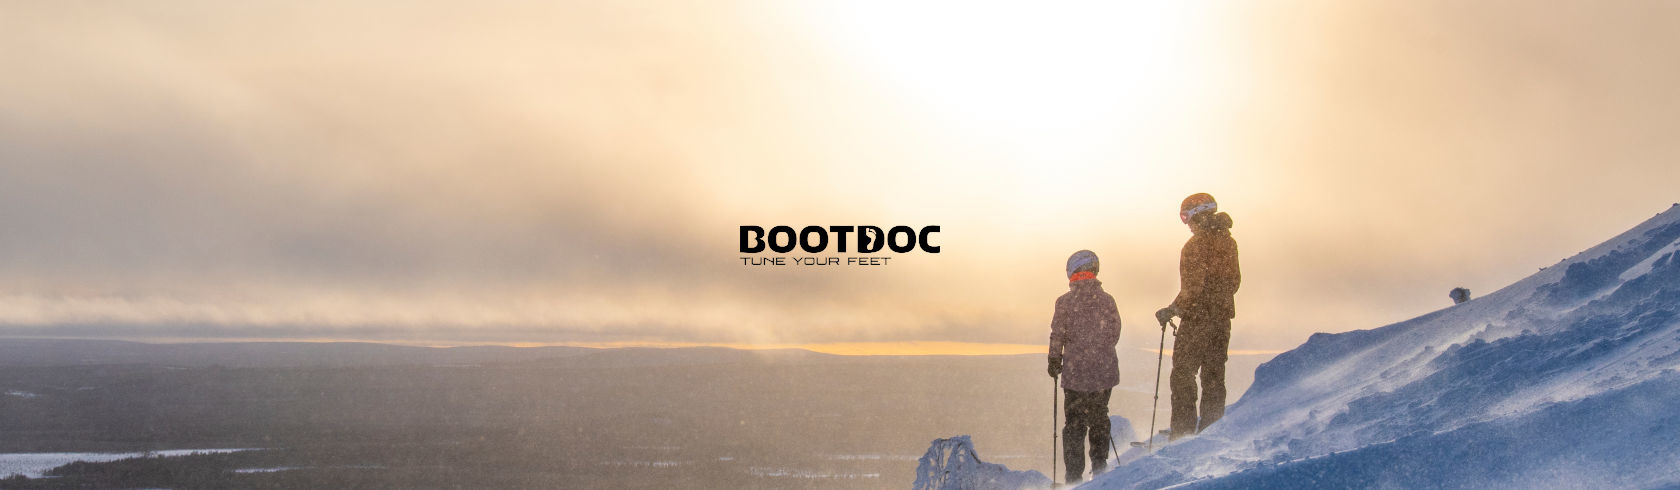 Bootdoc brand logo